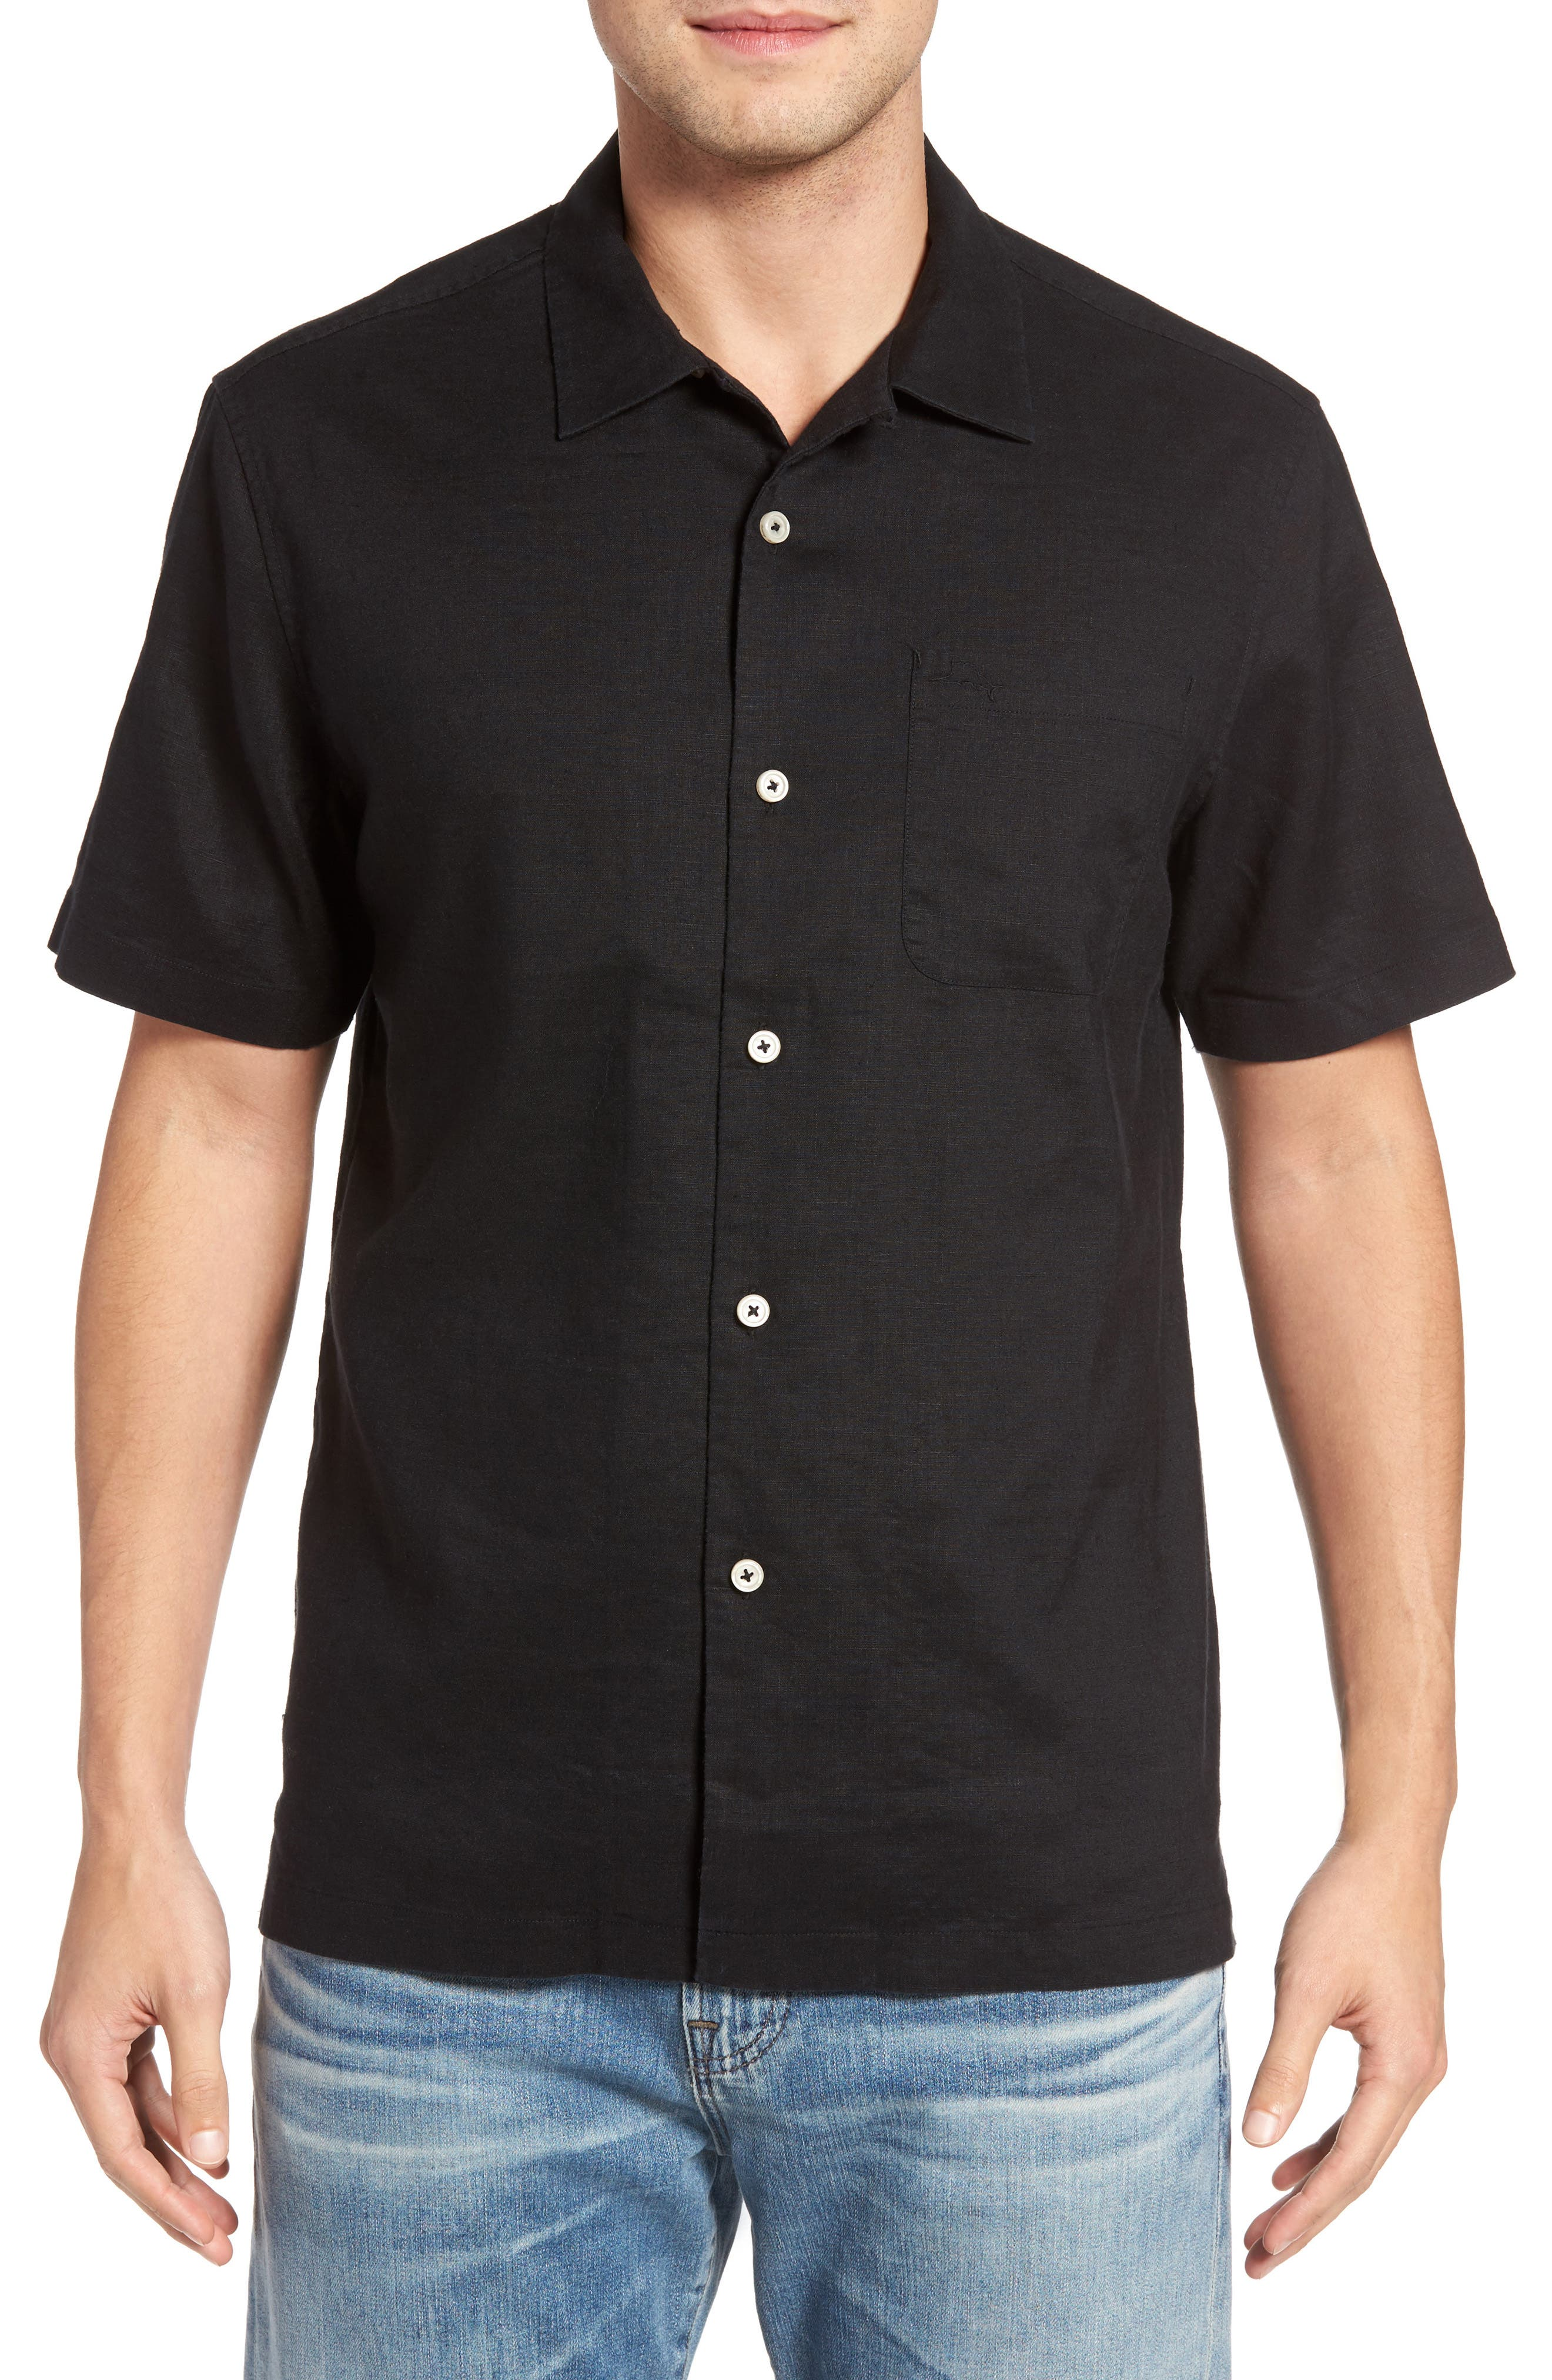 Tommy Bahama Monaco Tides Standard Fit Linen Blend Camp Shirt